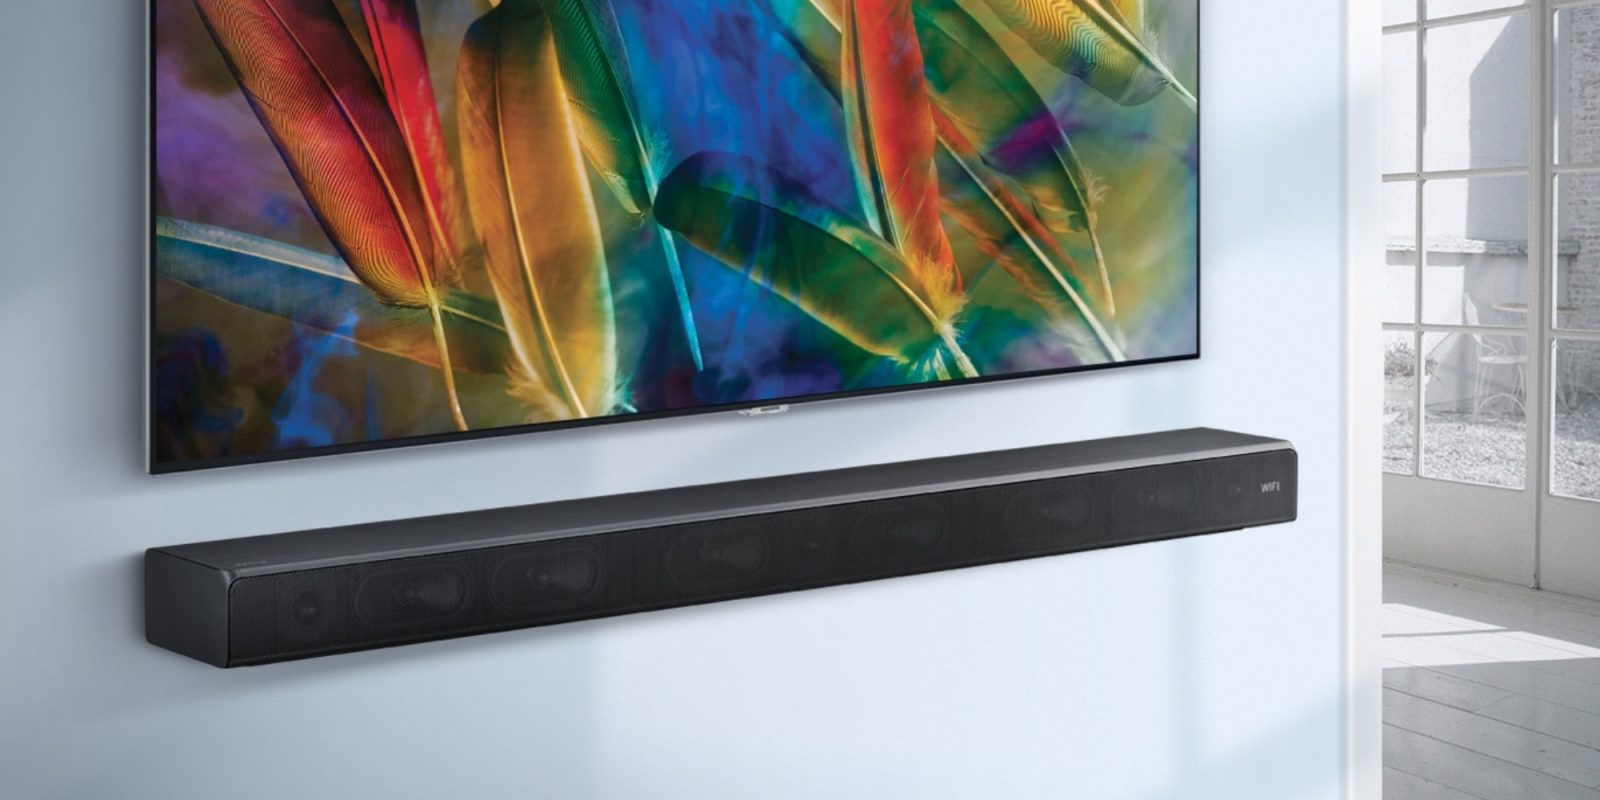 Amp up your home theater for $298 w/ Samsung's Premium Soundbar (Reg. $400)